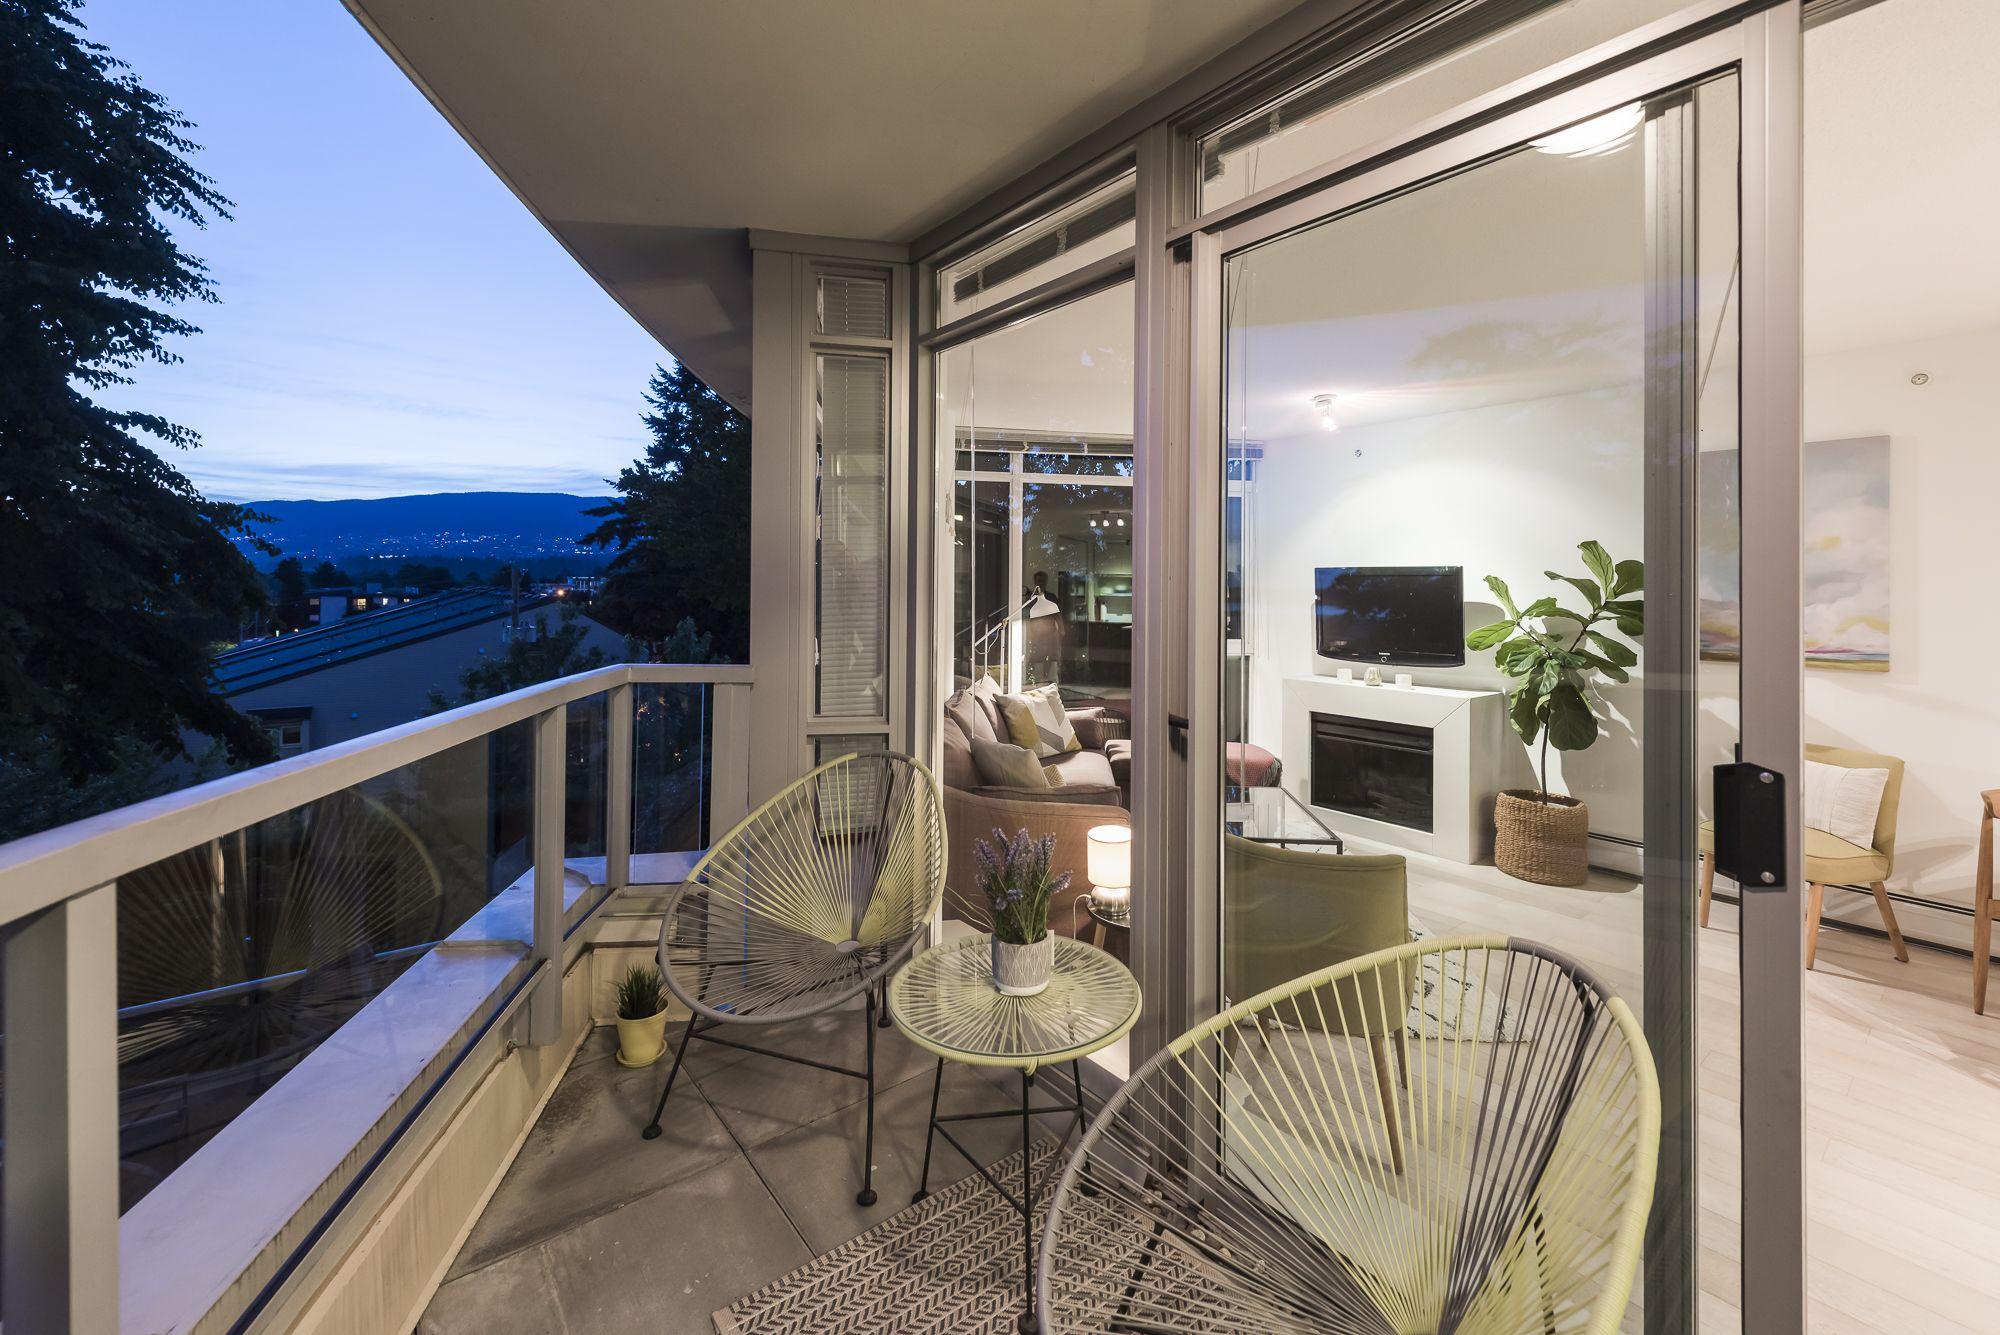 Lower Lonsdale Condo for sale: Ventana 2 bedroom  European Appliance, Hardwood Floors 1,114 sq.ft. (Listed 2019-07-15)